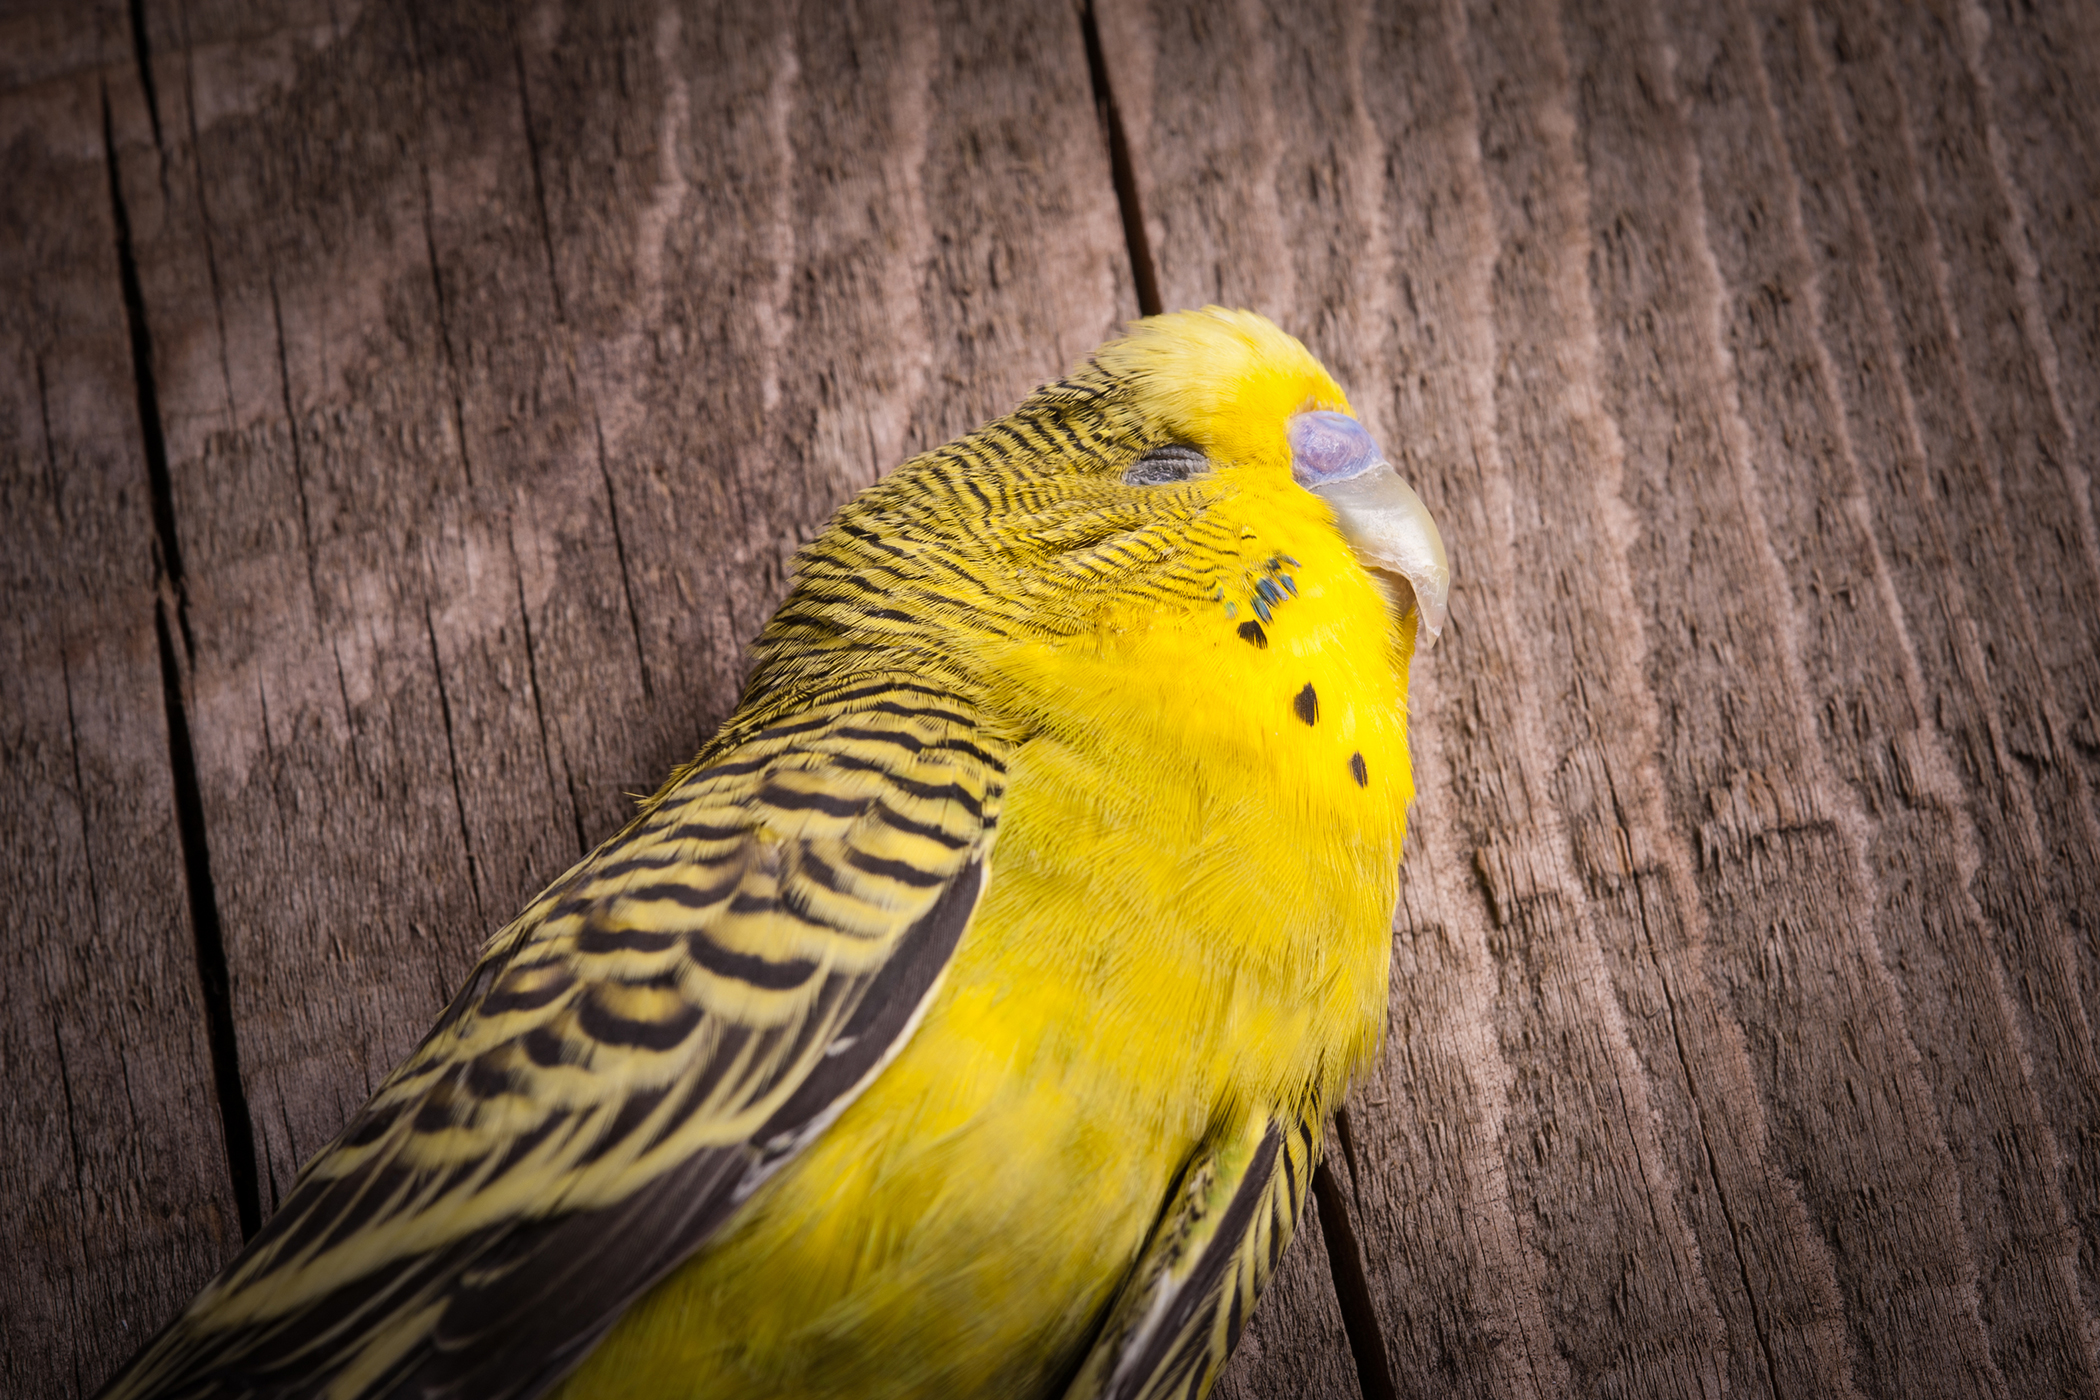 Egg Yolk Peritonitis in Birds